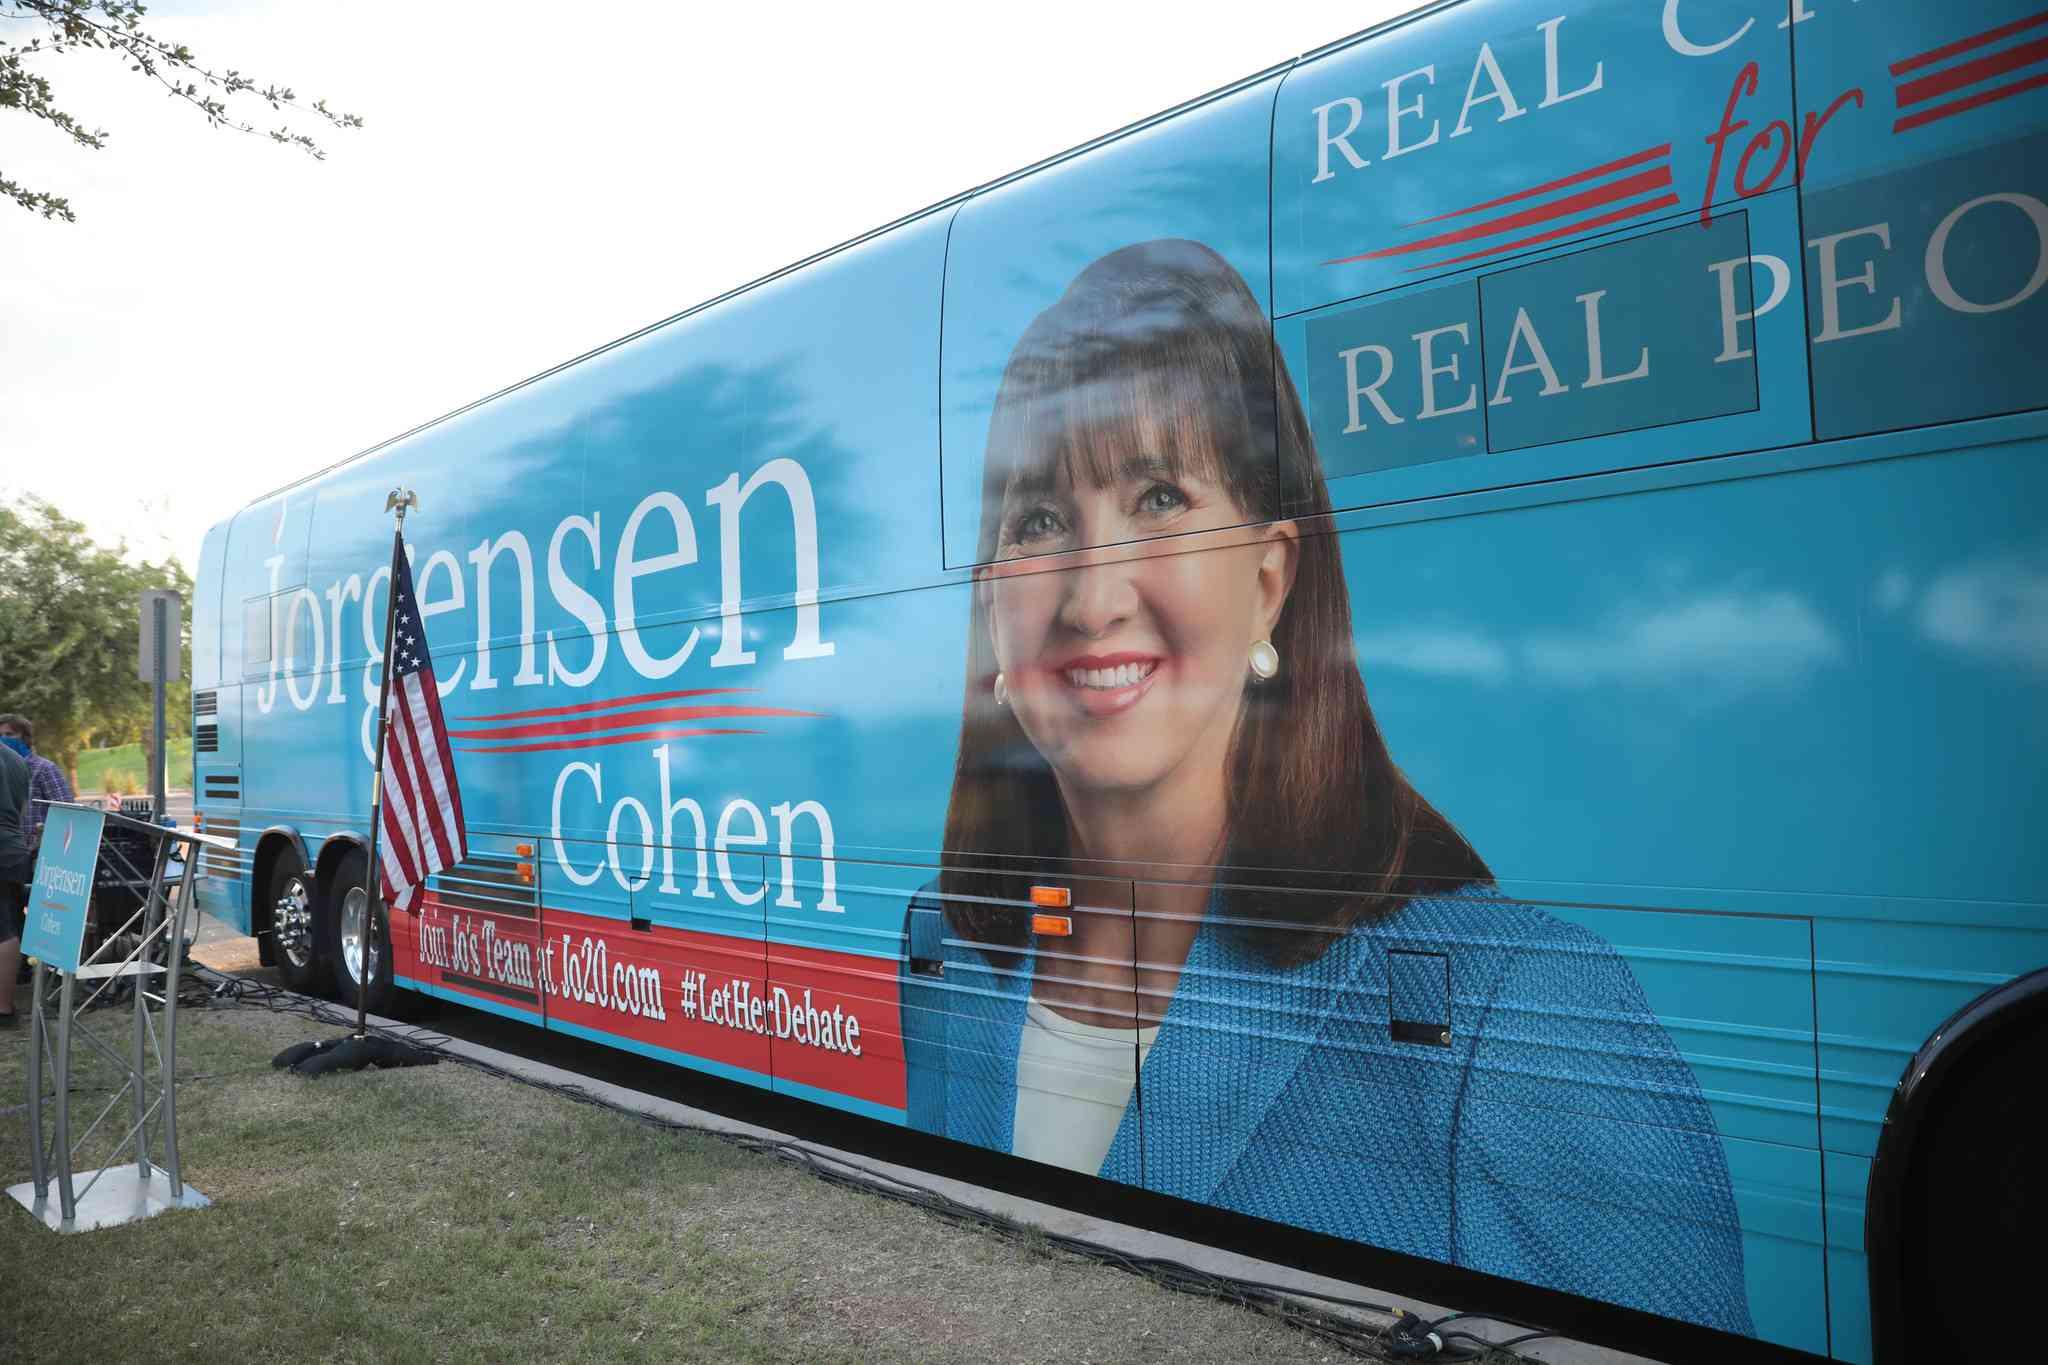 Jo Jorgensen's image on a campaign bus